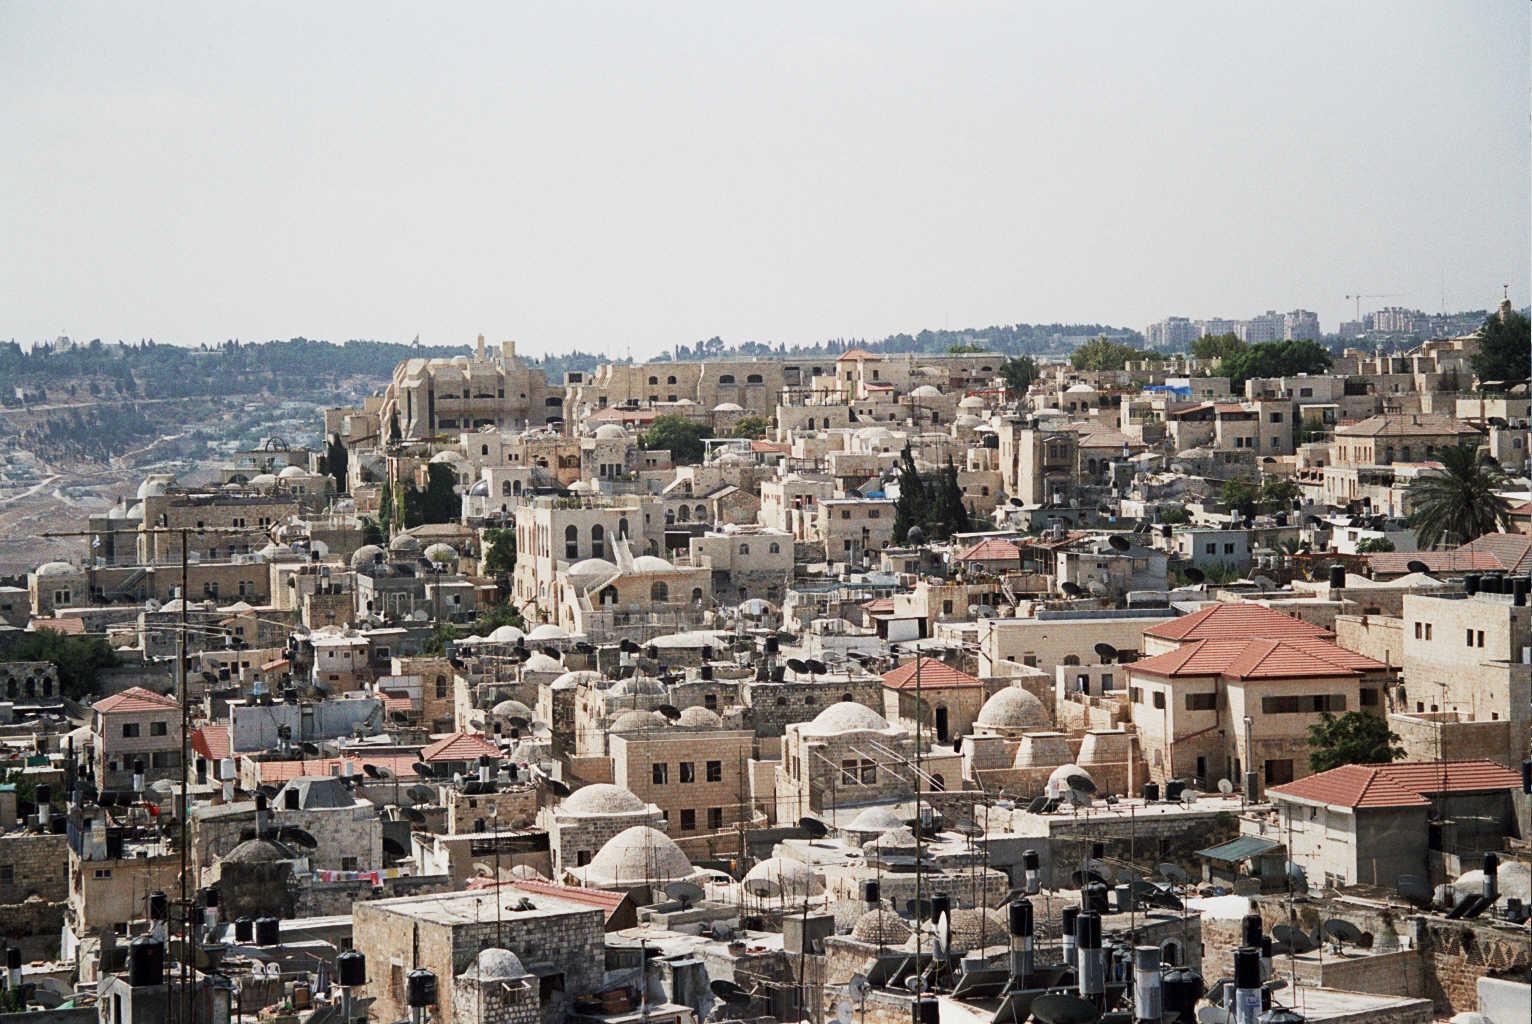 File:העיר העתיקה - תצפית גגות 10.jpg - Wikimedia Commons